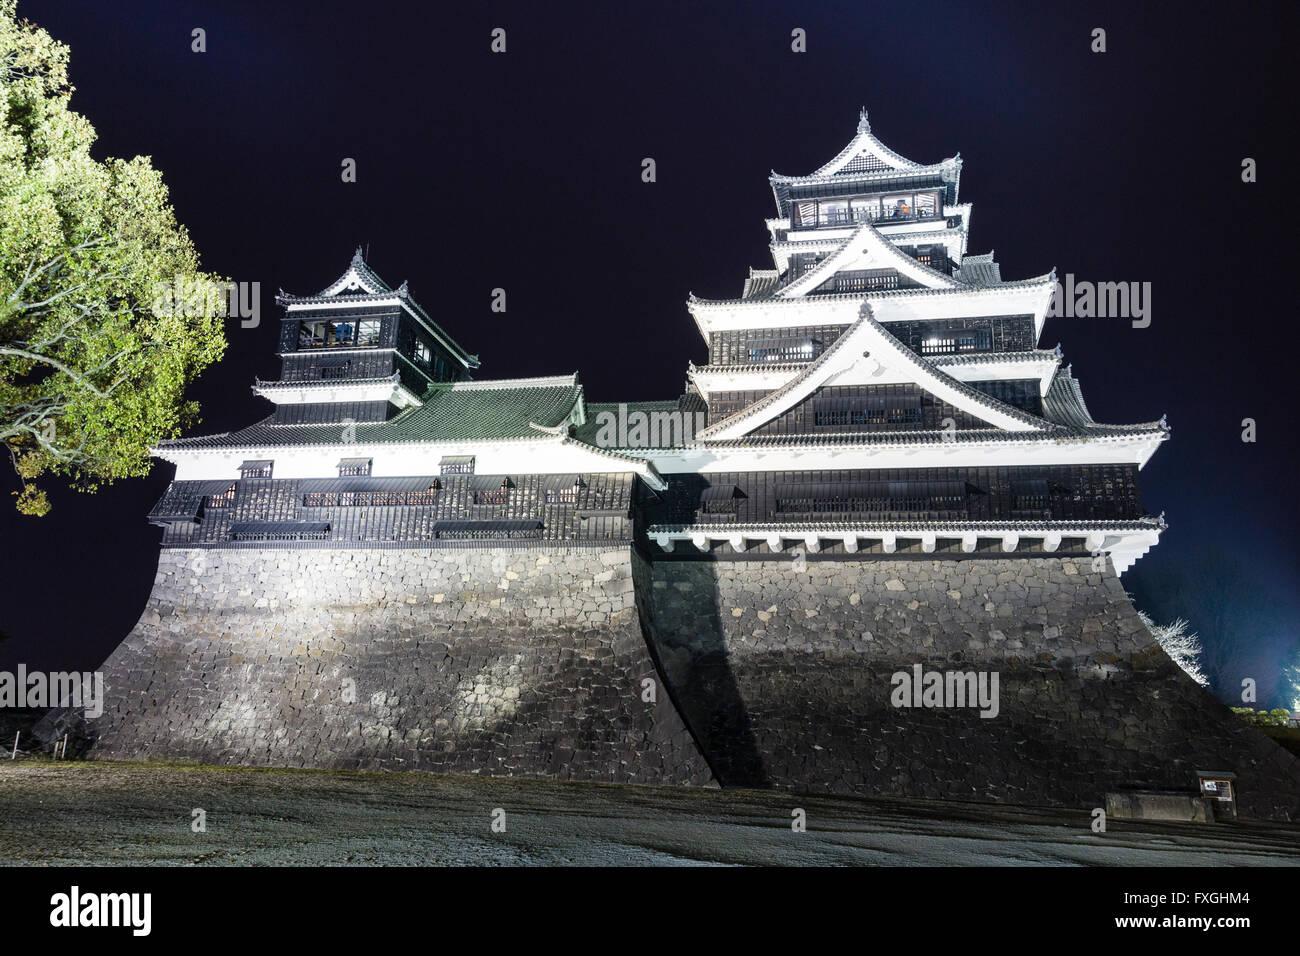 Japan, Kumamoto castle. The main double keep, Daitenshu and Shotenshu, greater and lesser keeps, illuminated at - Stock Image